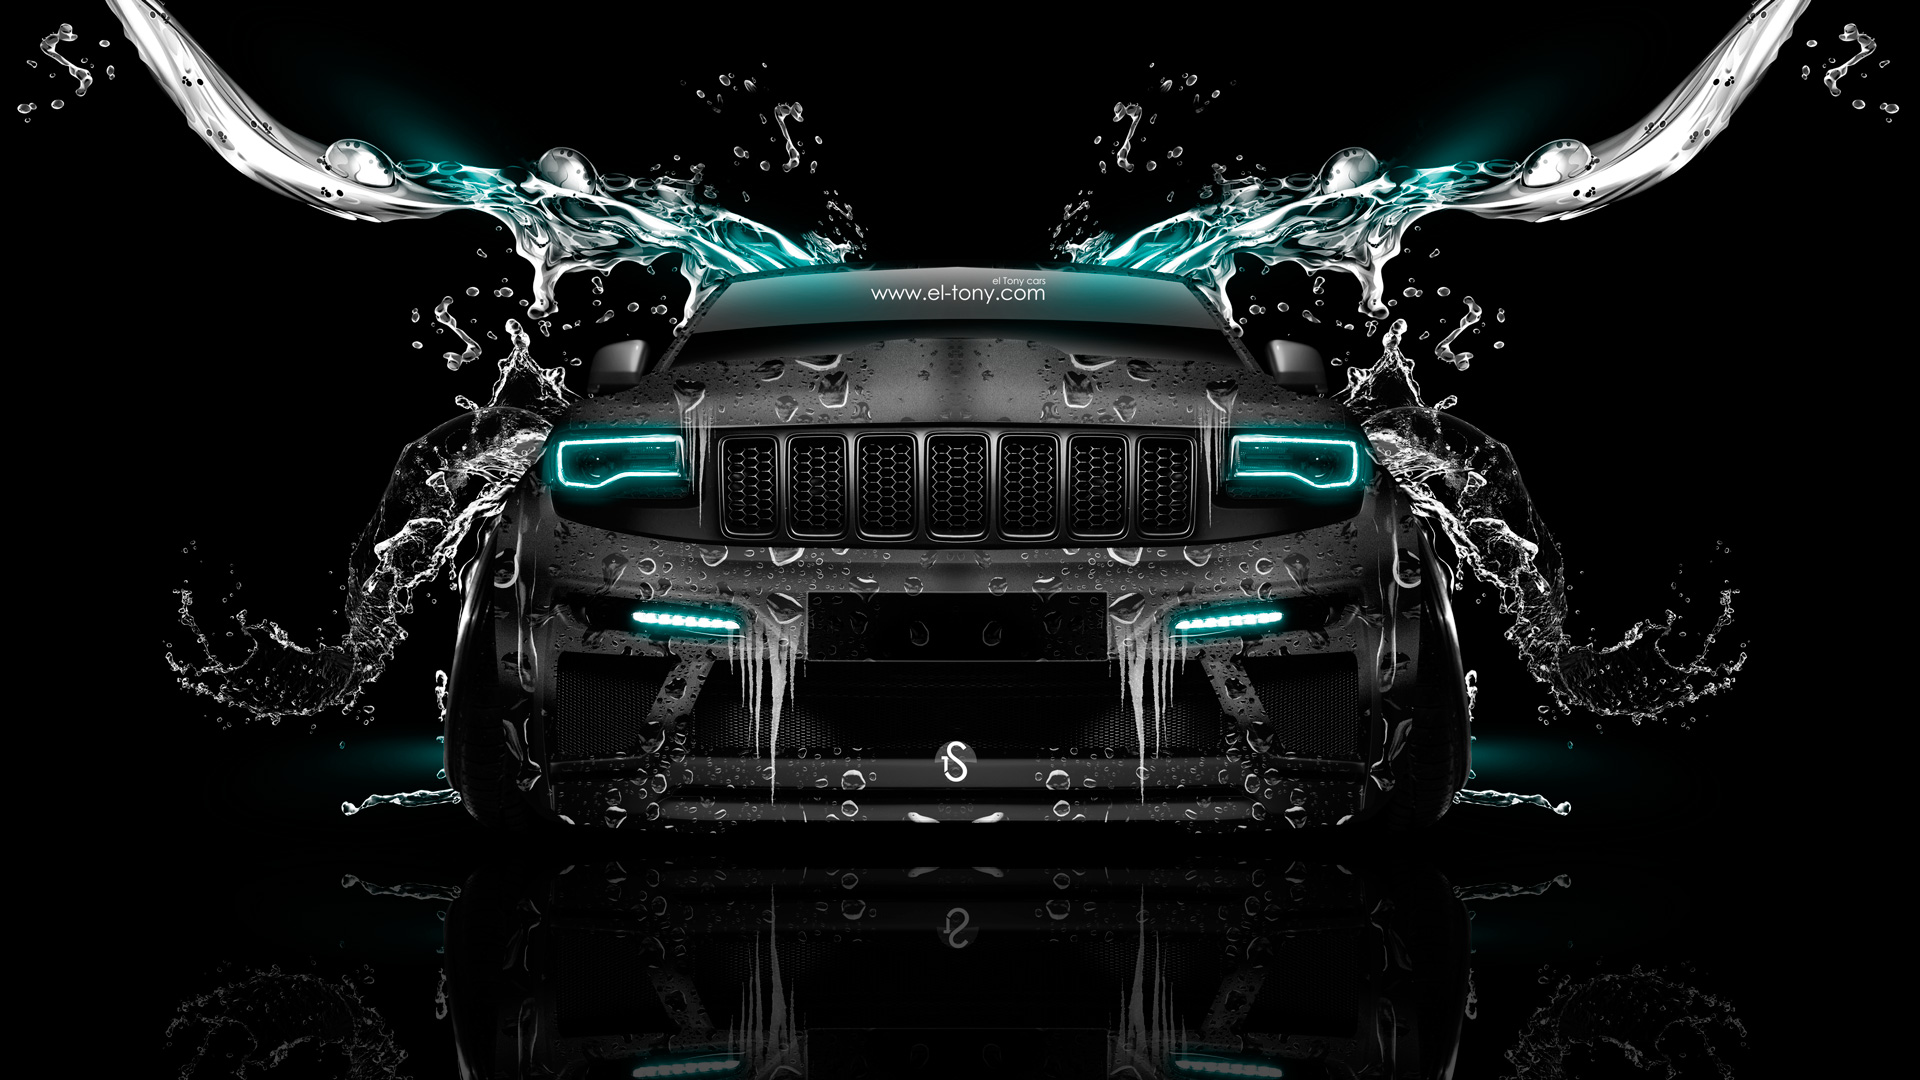 Jeep Grand Cherokee SRT8 Front Water Car 2014 Azure Neon HD Wallpapers 1920x1080